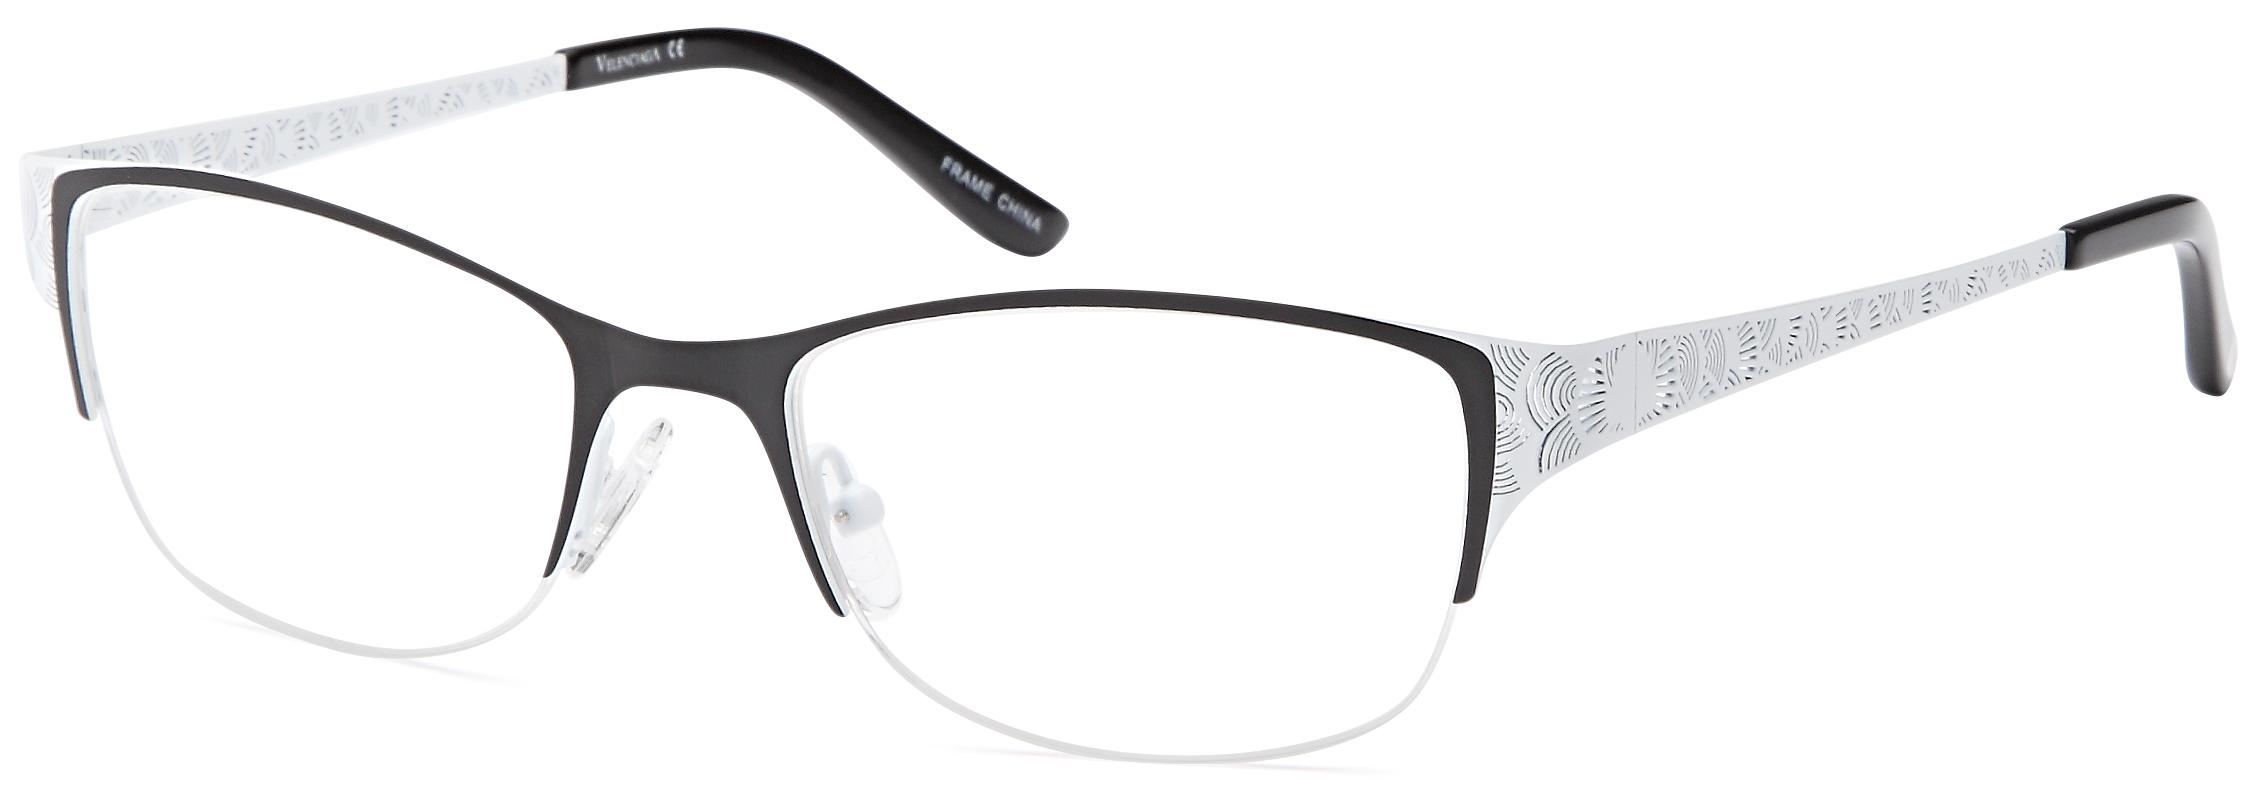 c6b9c7d05c32 Eyeglass Frames Black Vs Brown | Wiring Diagram Database